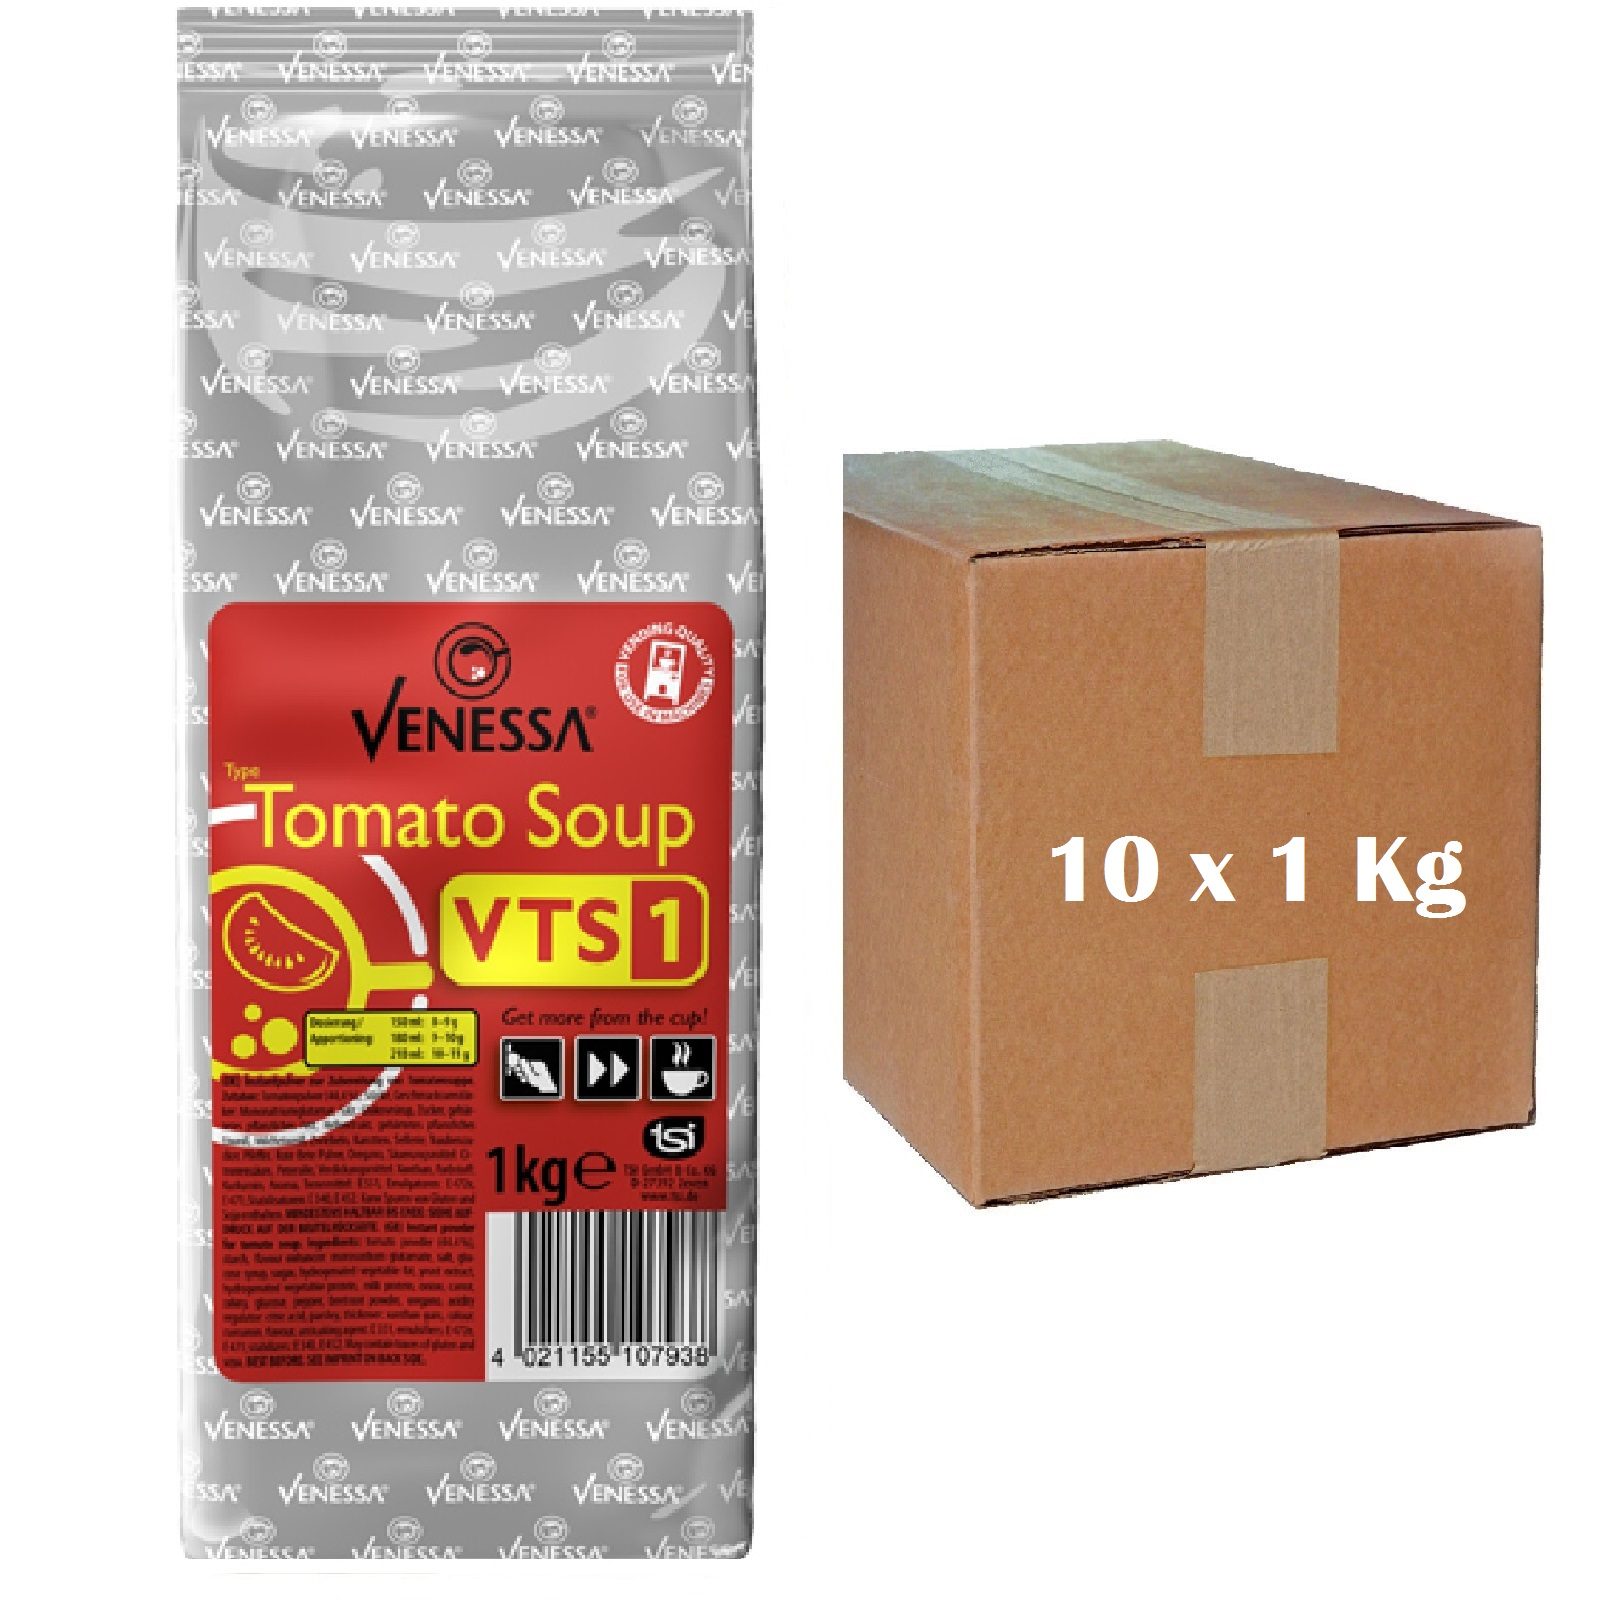 Venessa Tomato Soup VTS1 Instantsuppe 10 x 1kg für Automaten